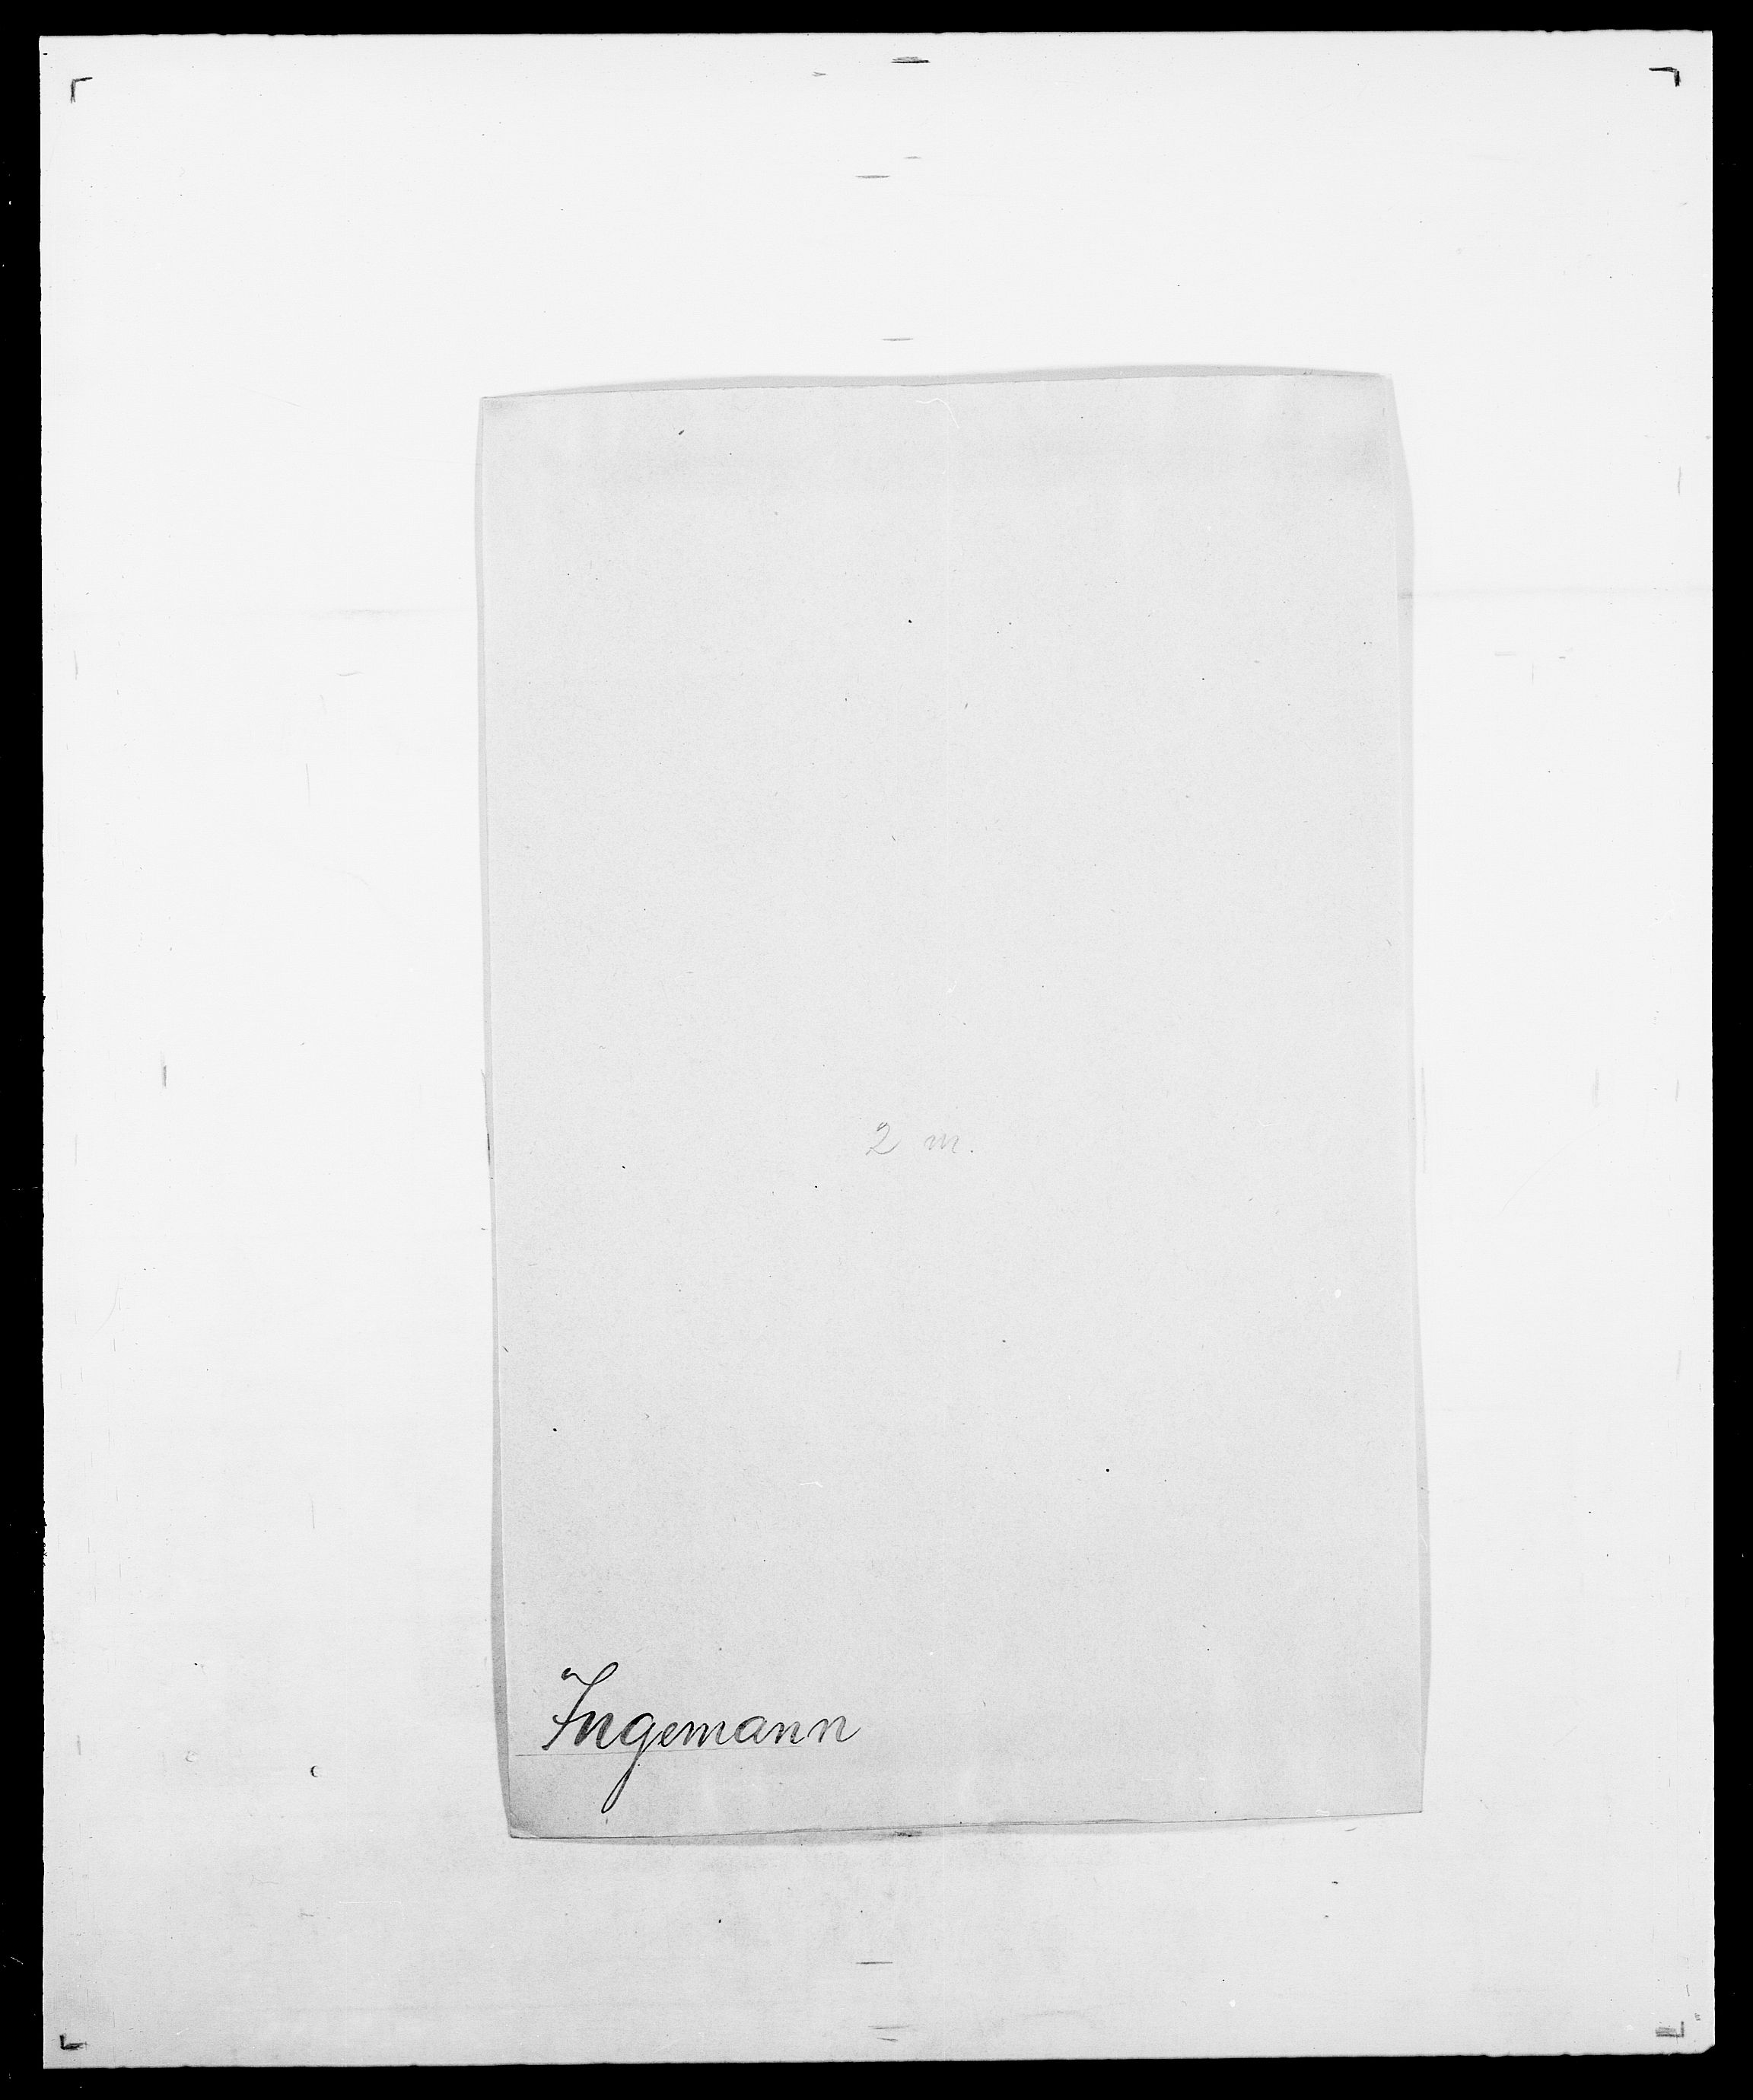 SAO, Delgobe, Charles Antoine - samling, D/Da/L0019: van der Hude - Joys, s. 781